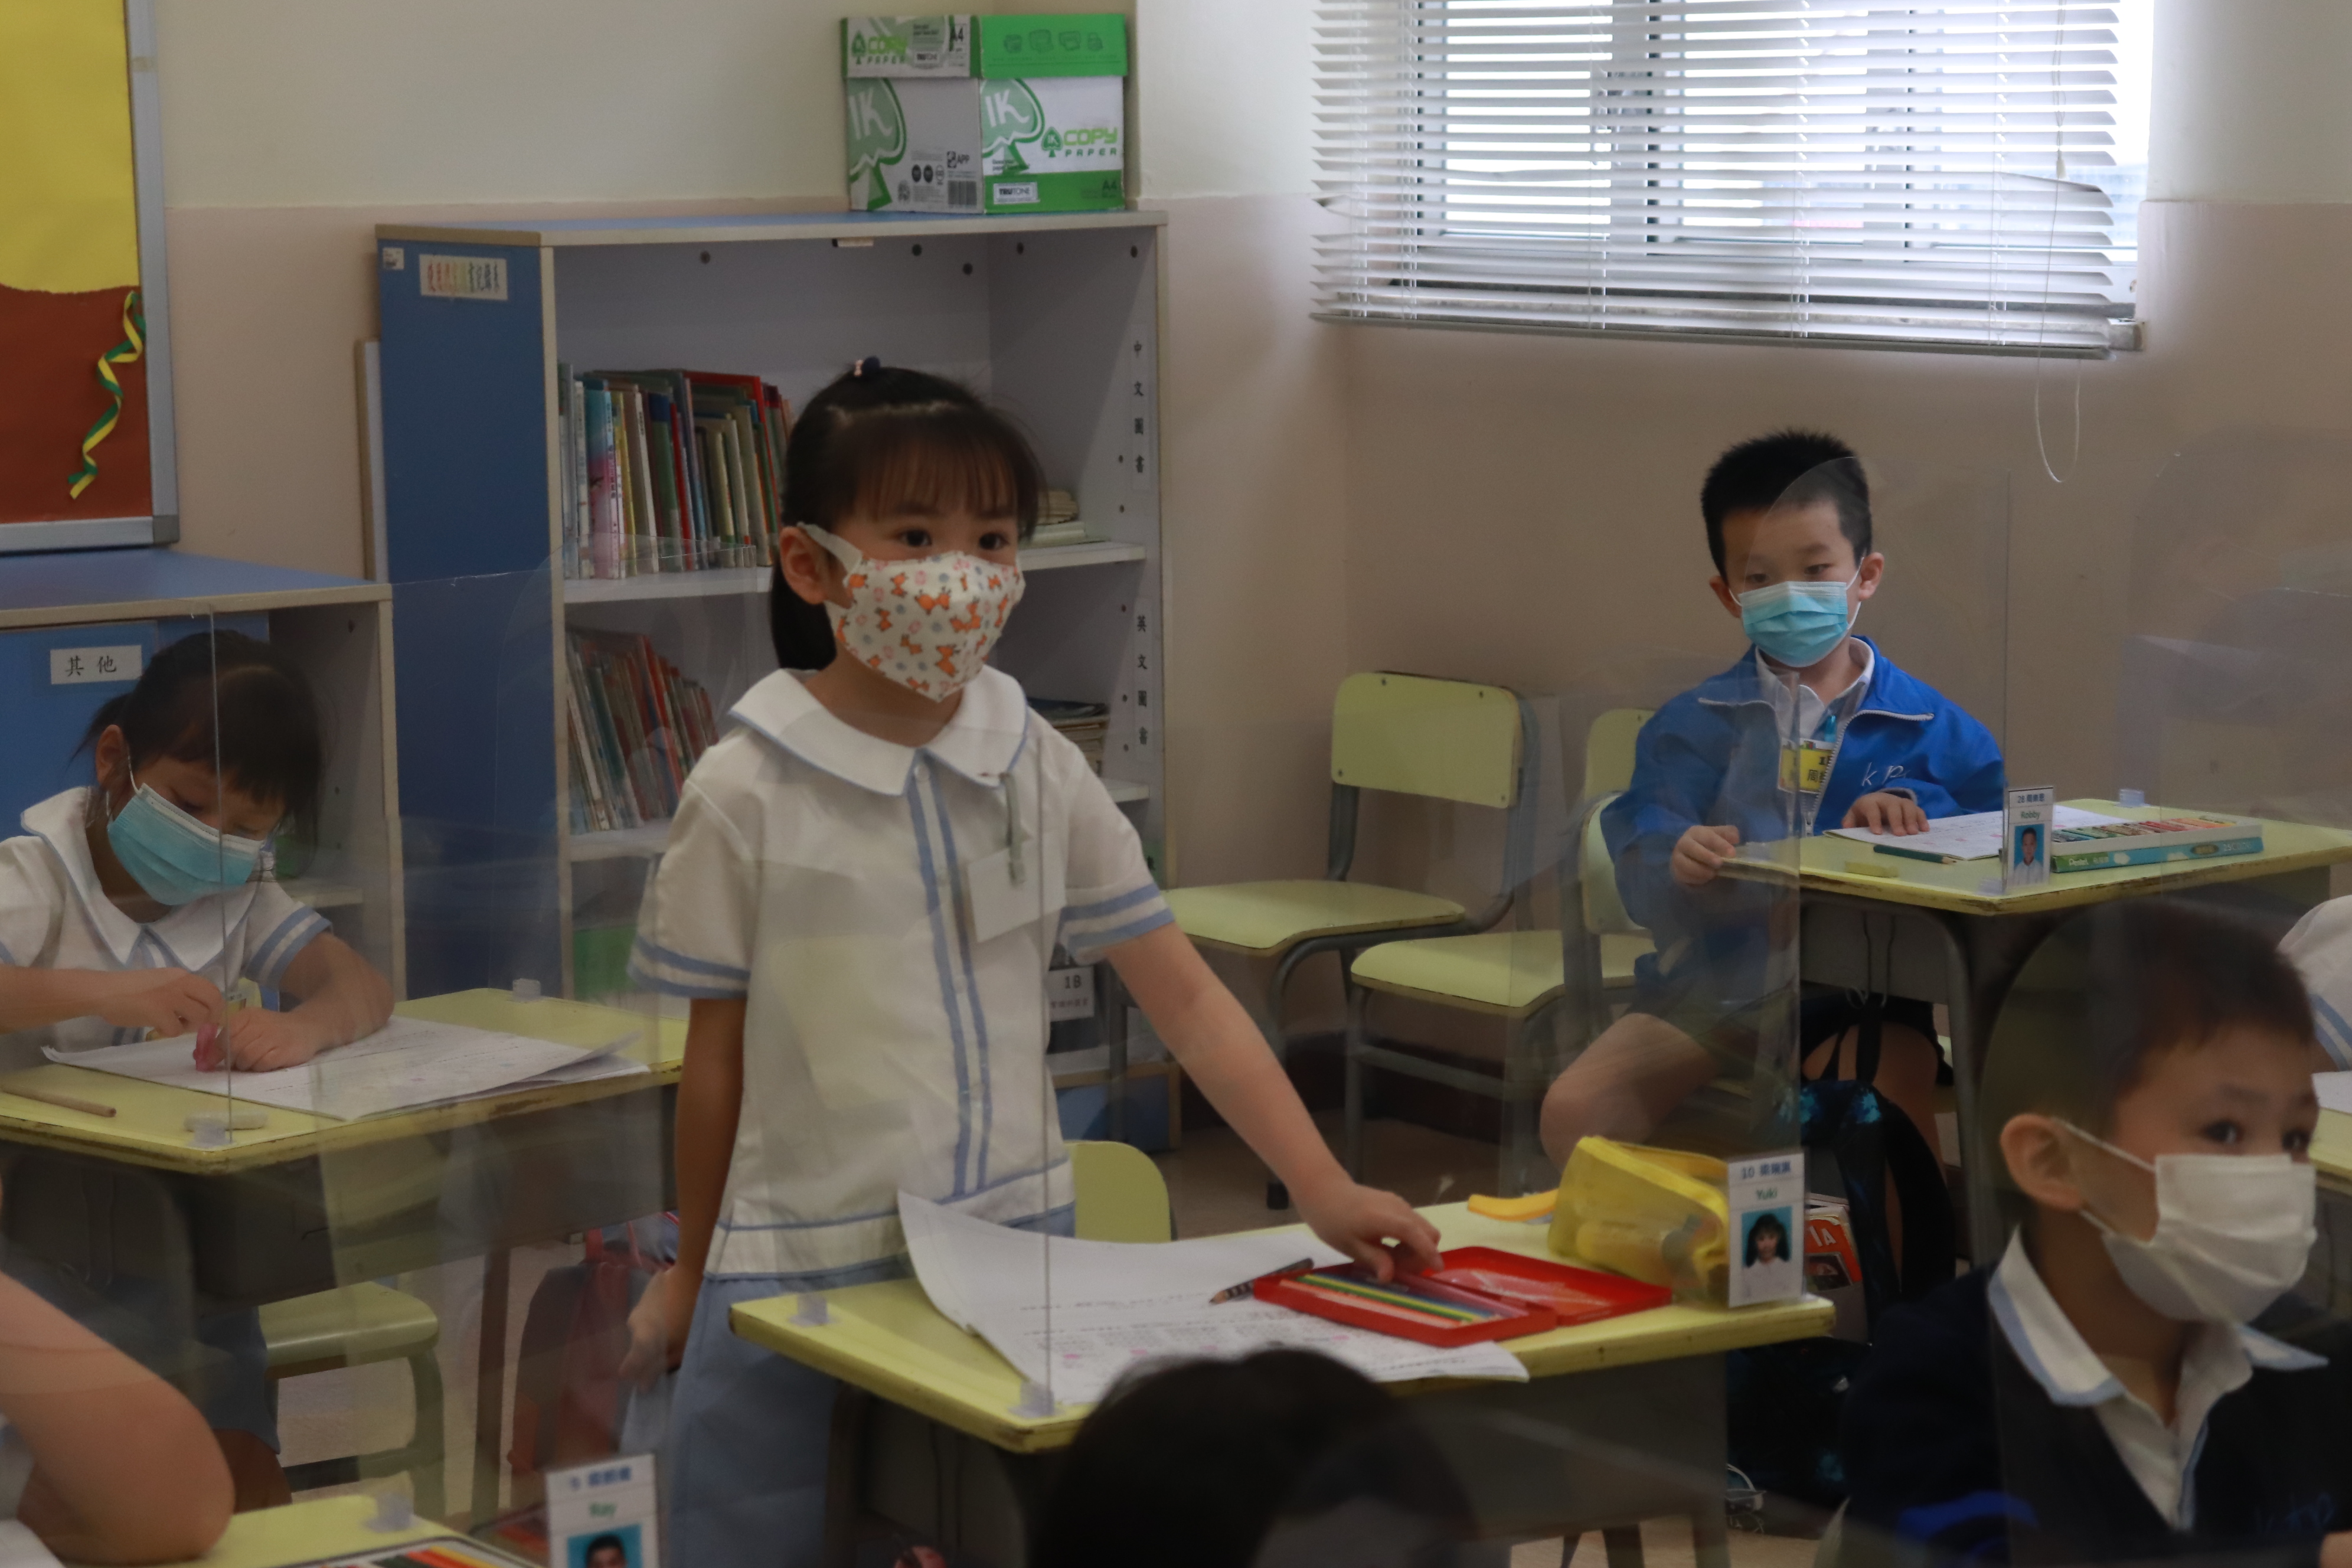 http://keito.school.hk/sites/default/files/img_6730.jpg